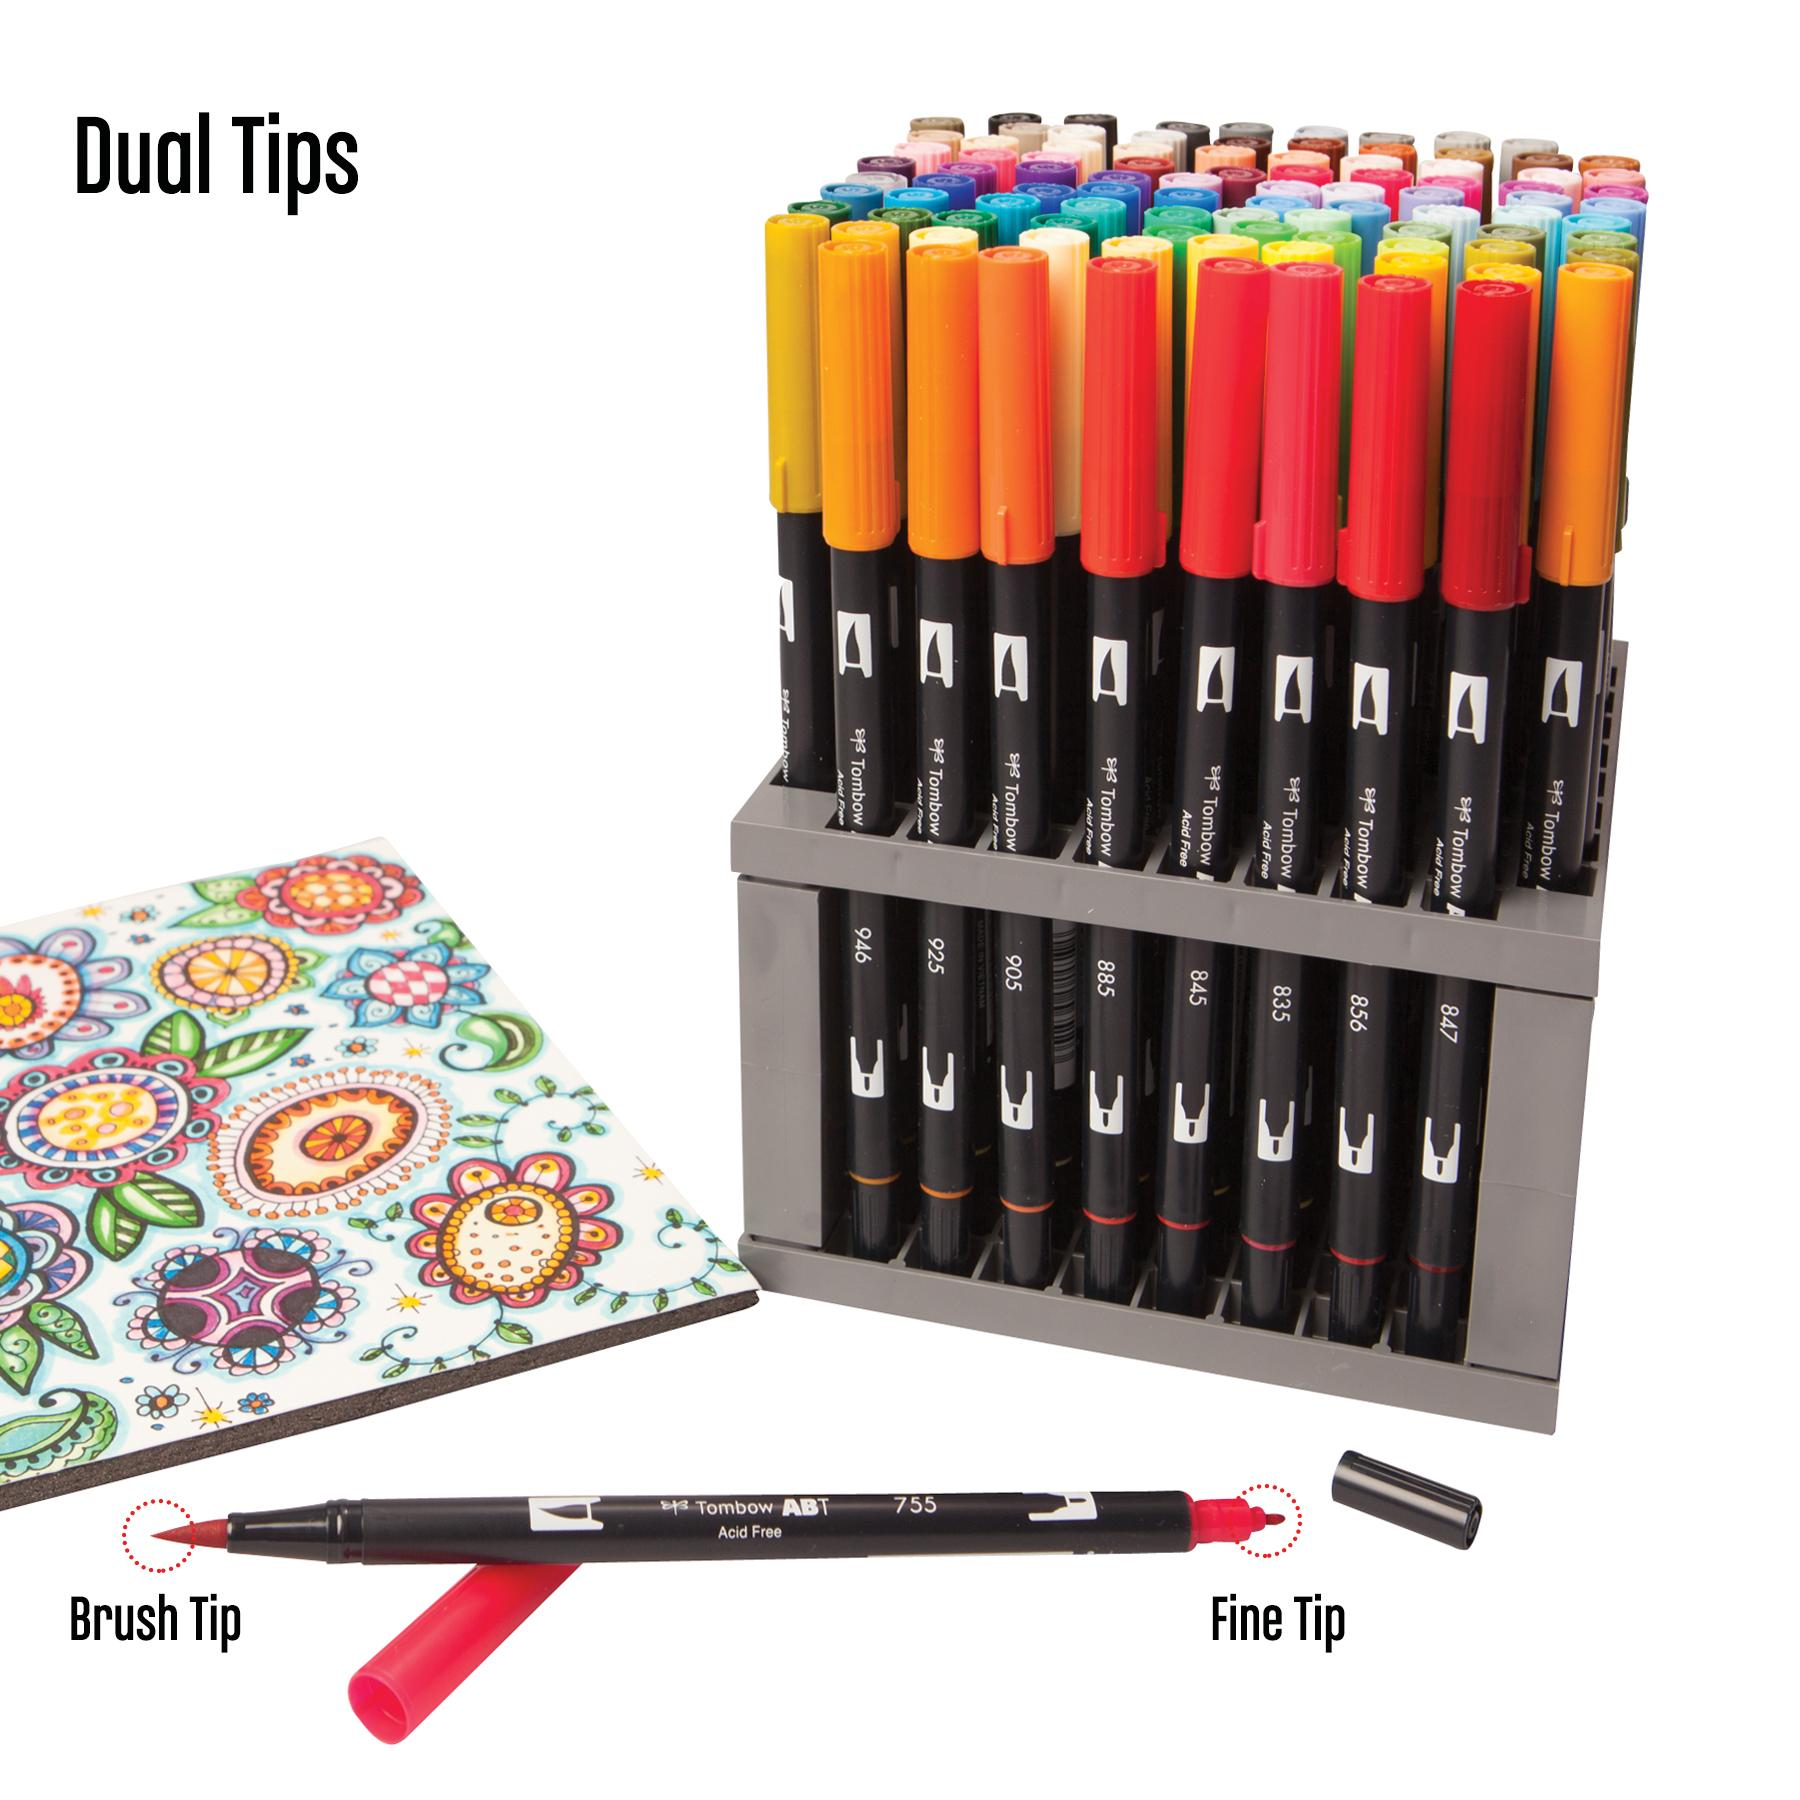 Amazon.com: Tombow Dual Brush Pen Desk Stand, 96 Color Set ...  Amazon.com: Tom...